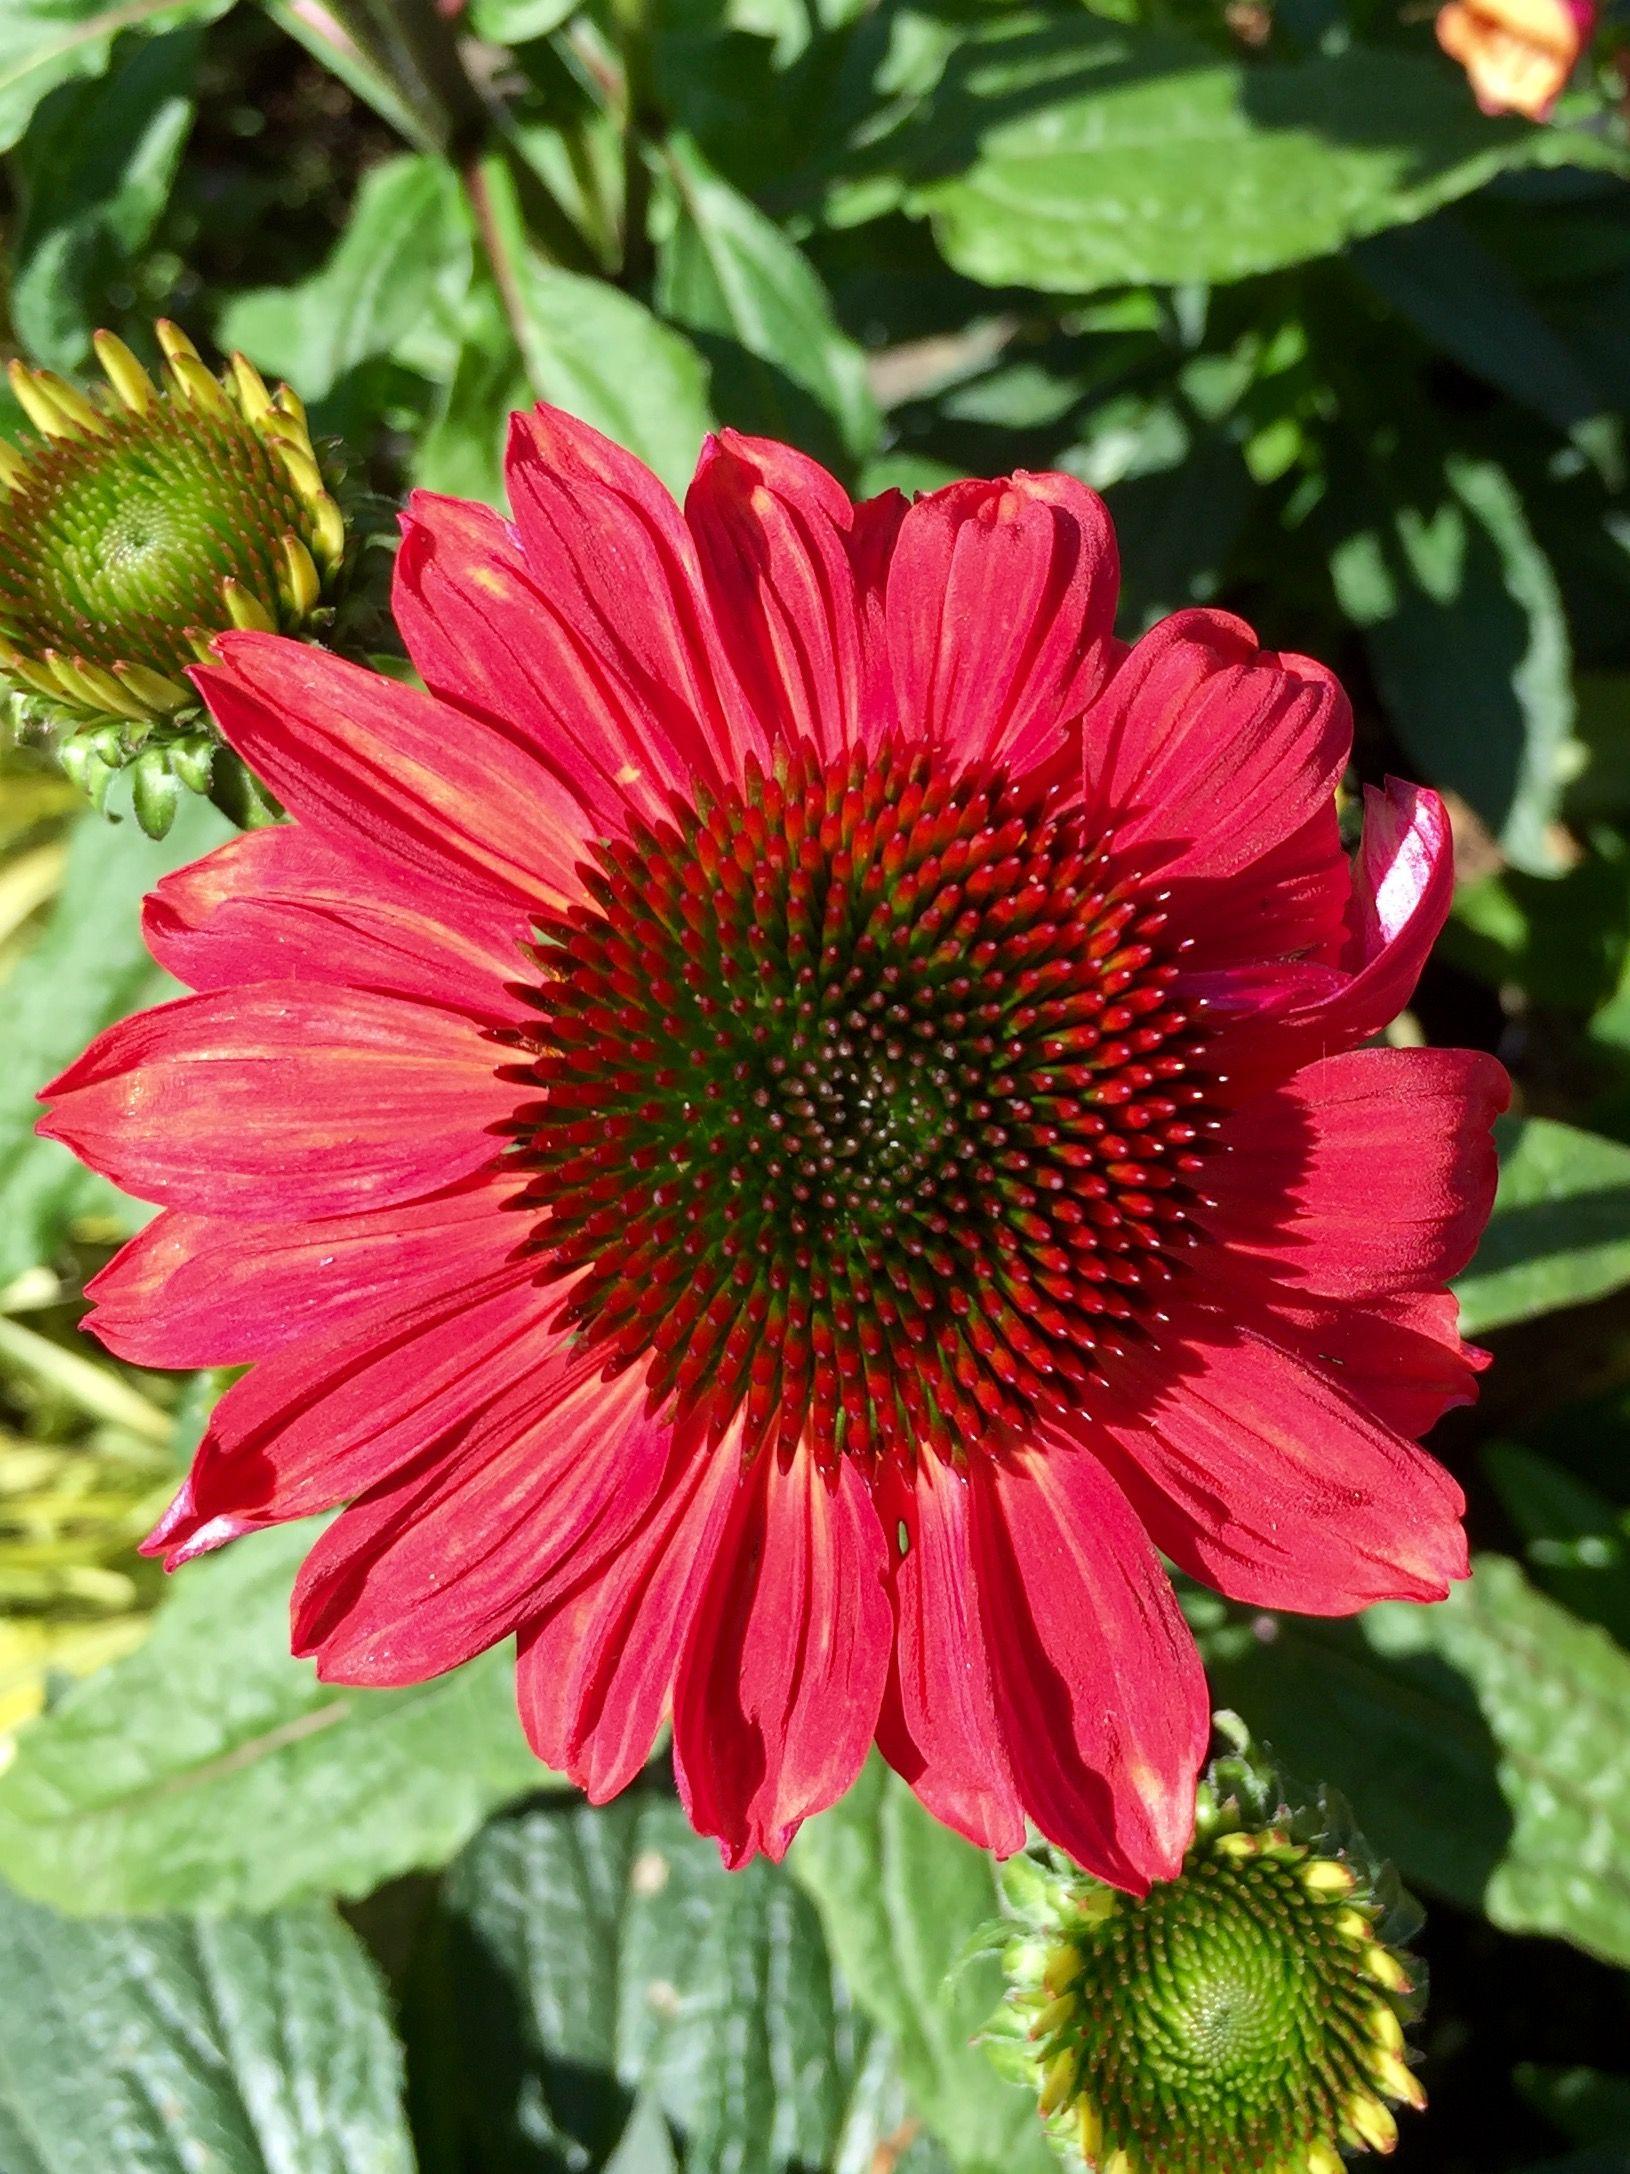 Sombrero Baja Burgundy Echinacea Roger S Gardens Springfield Or Rogers Gardens Echinacea Beautiful